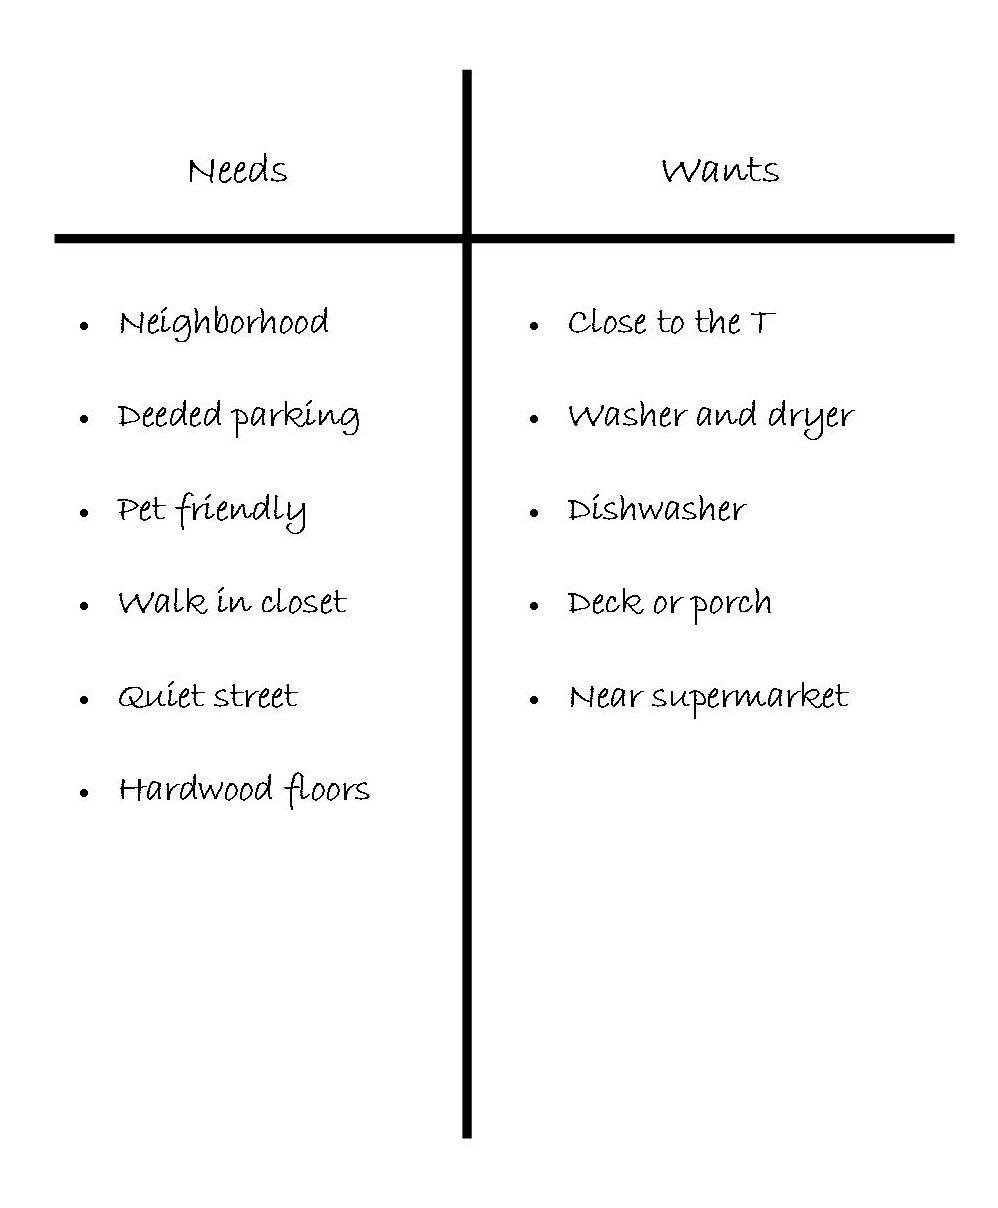 Wants vs. Needs | Maloney Properties Real Estate Blog